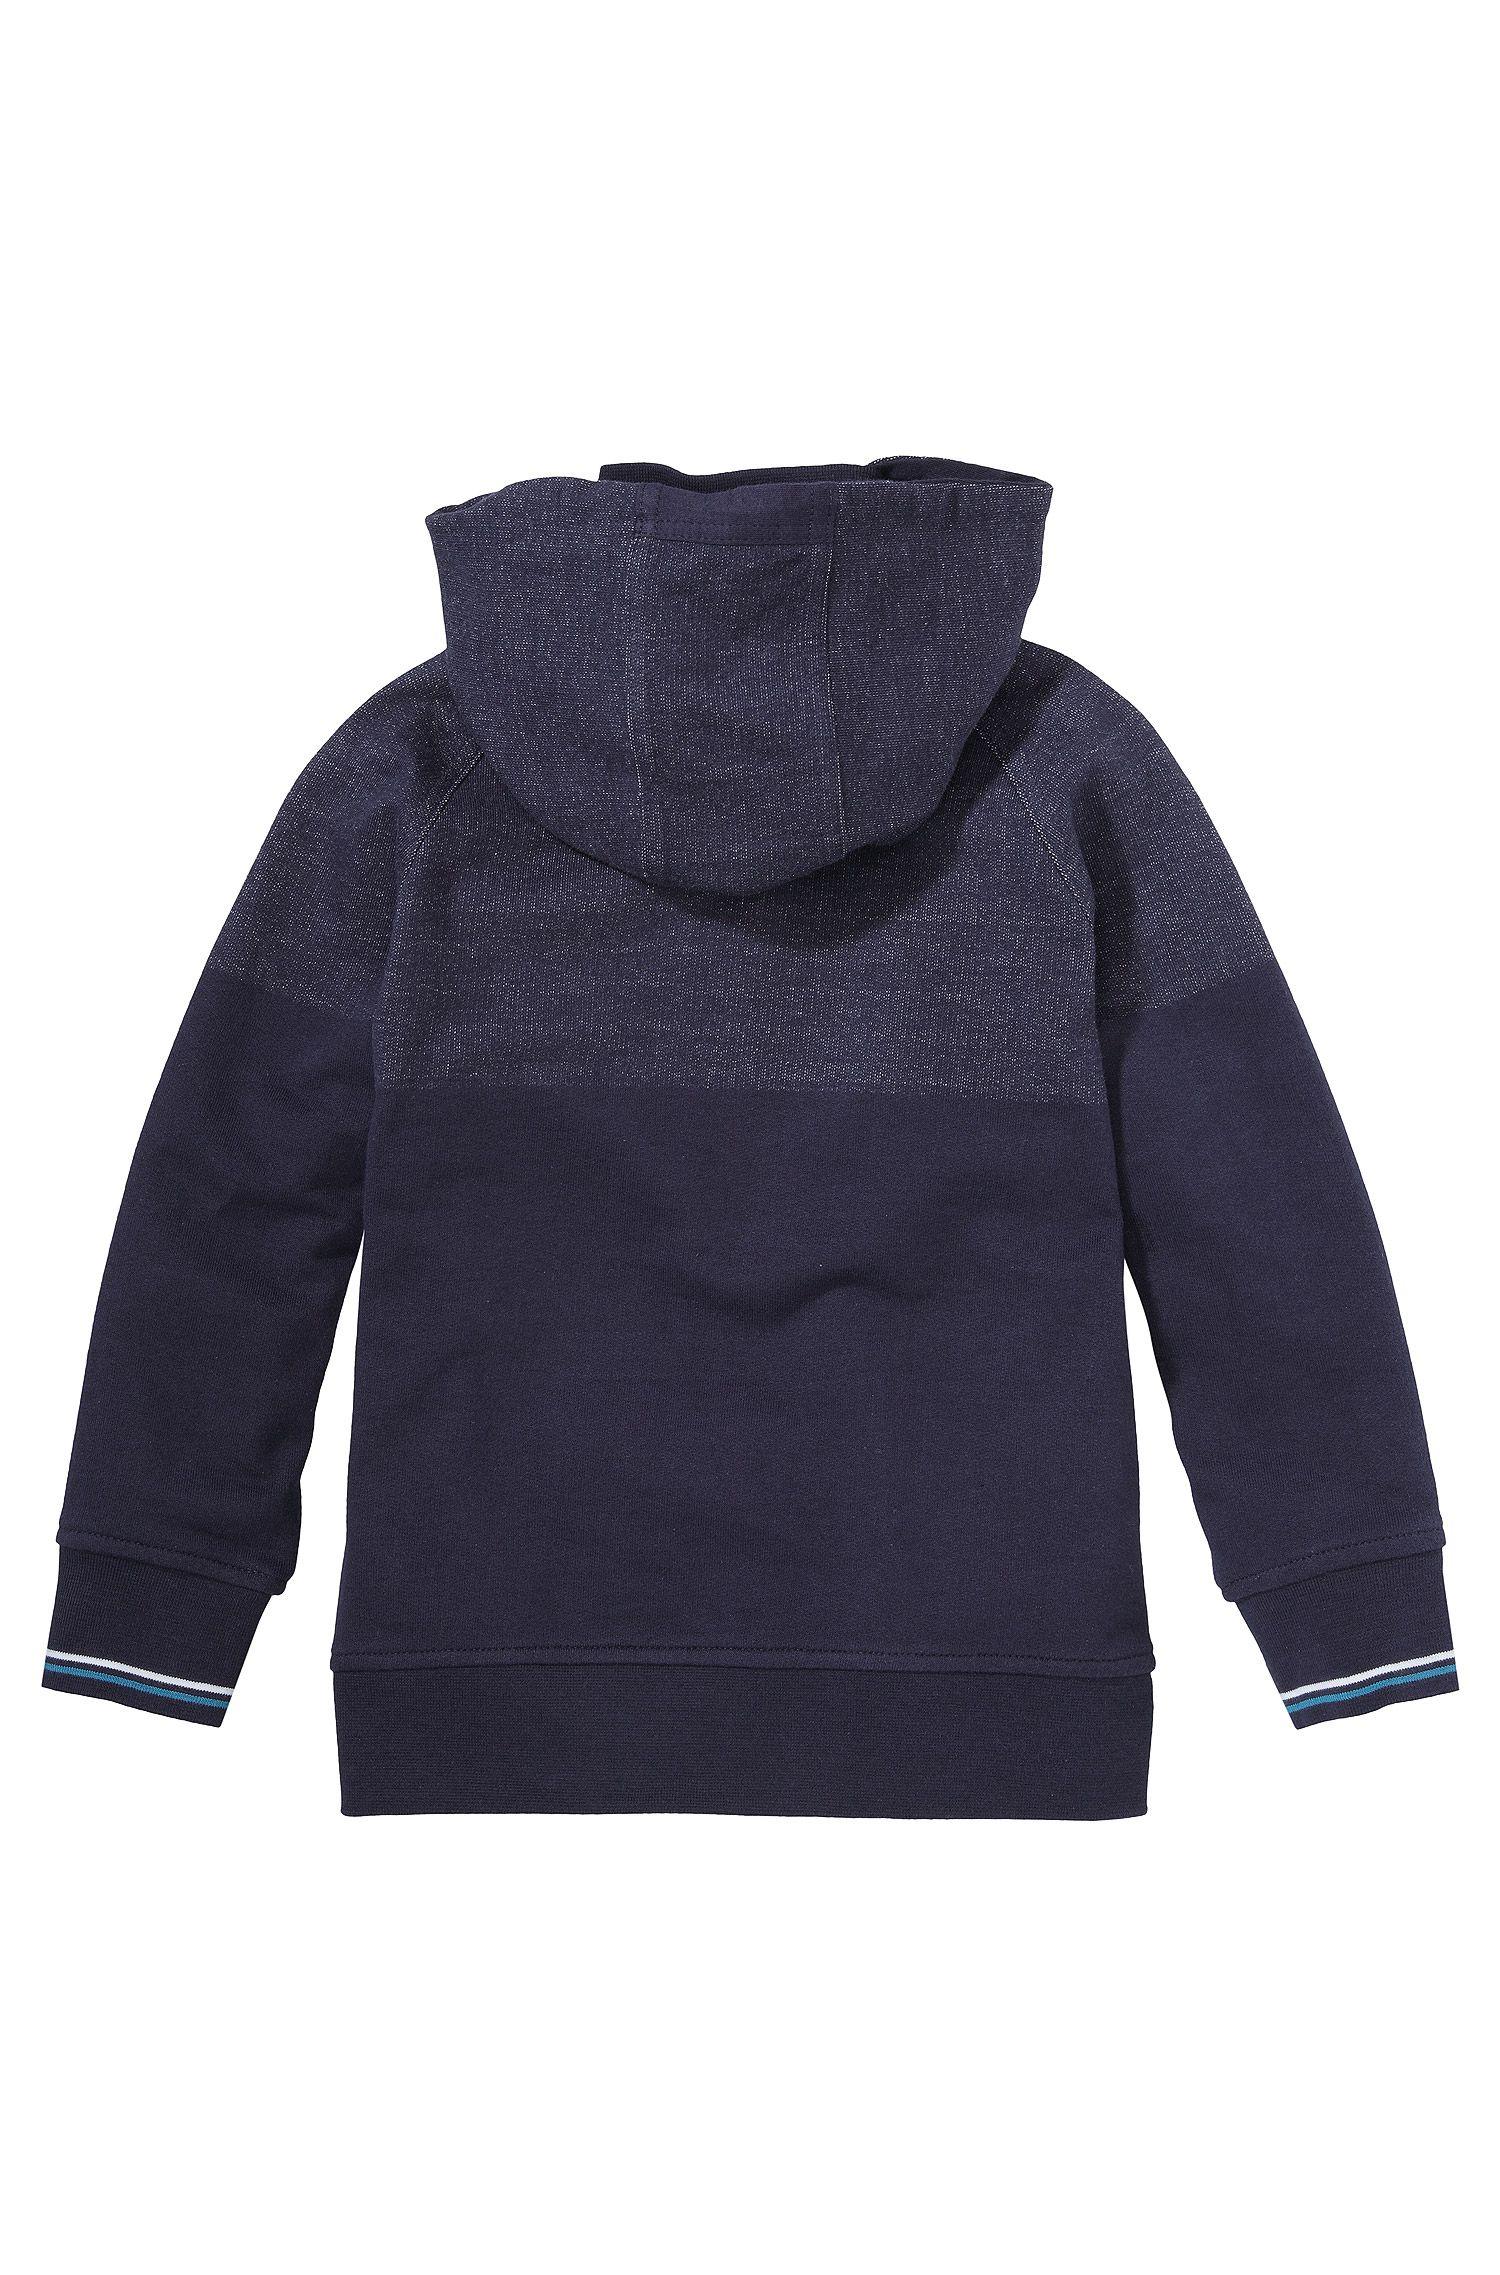 Kids-Kapuzen-Sweatshirt-Jacke ´J25789` aus Baumwolle